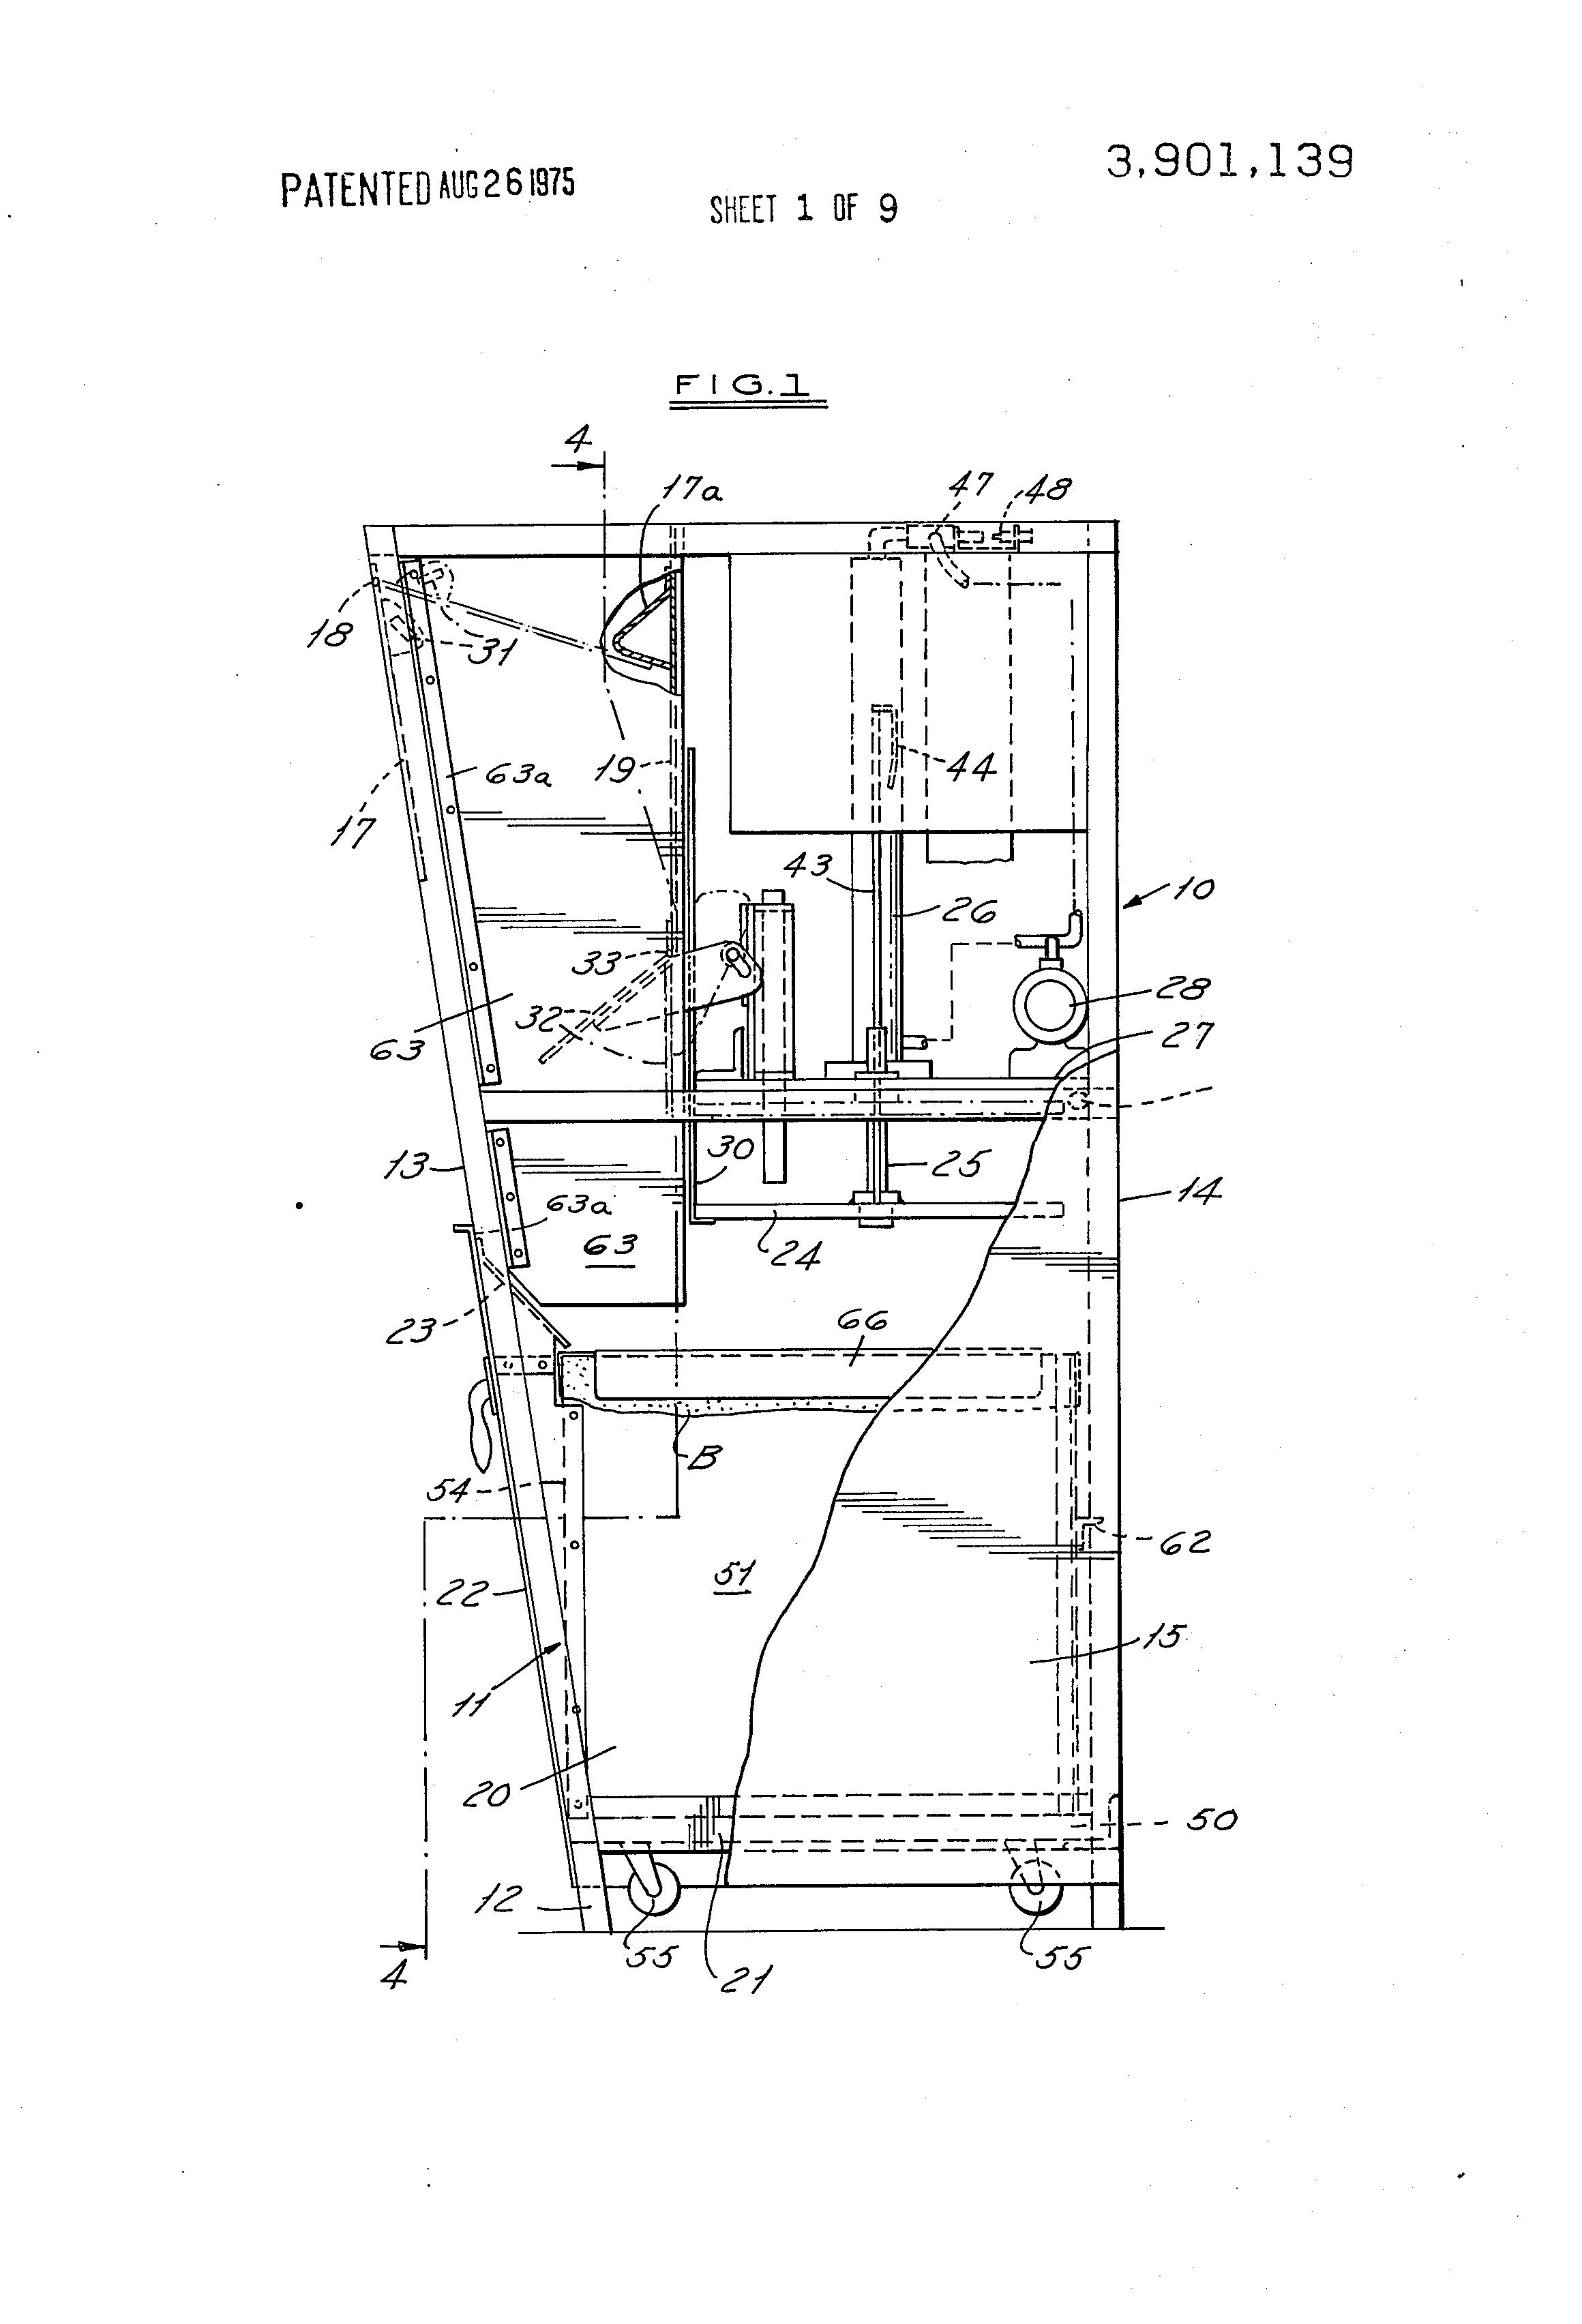 EL_1897] Whirlpool Trash Compactor Wiring Diagram Schematic Wiring